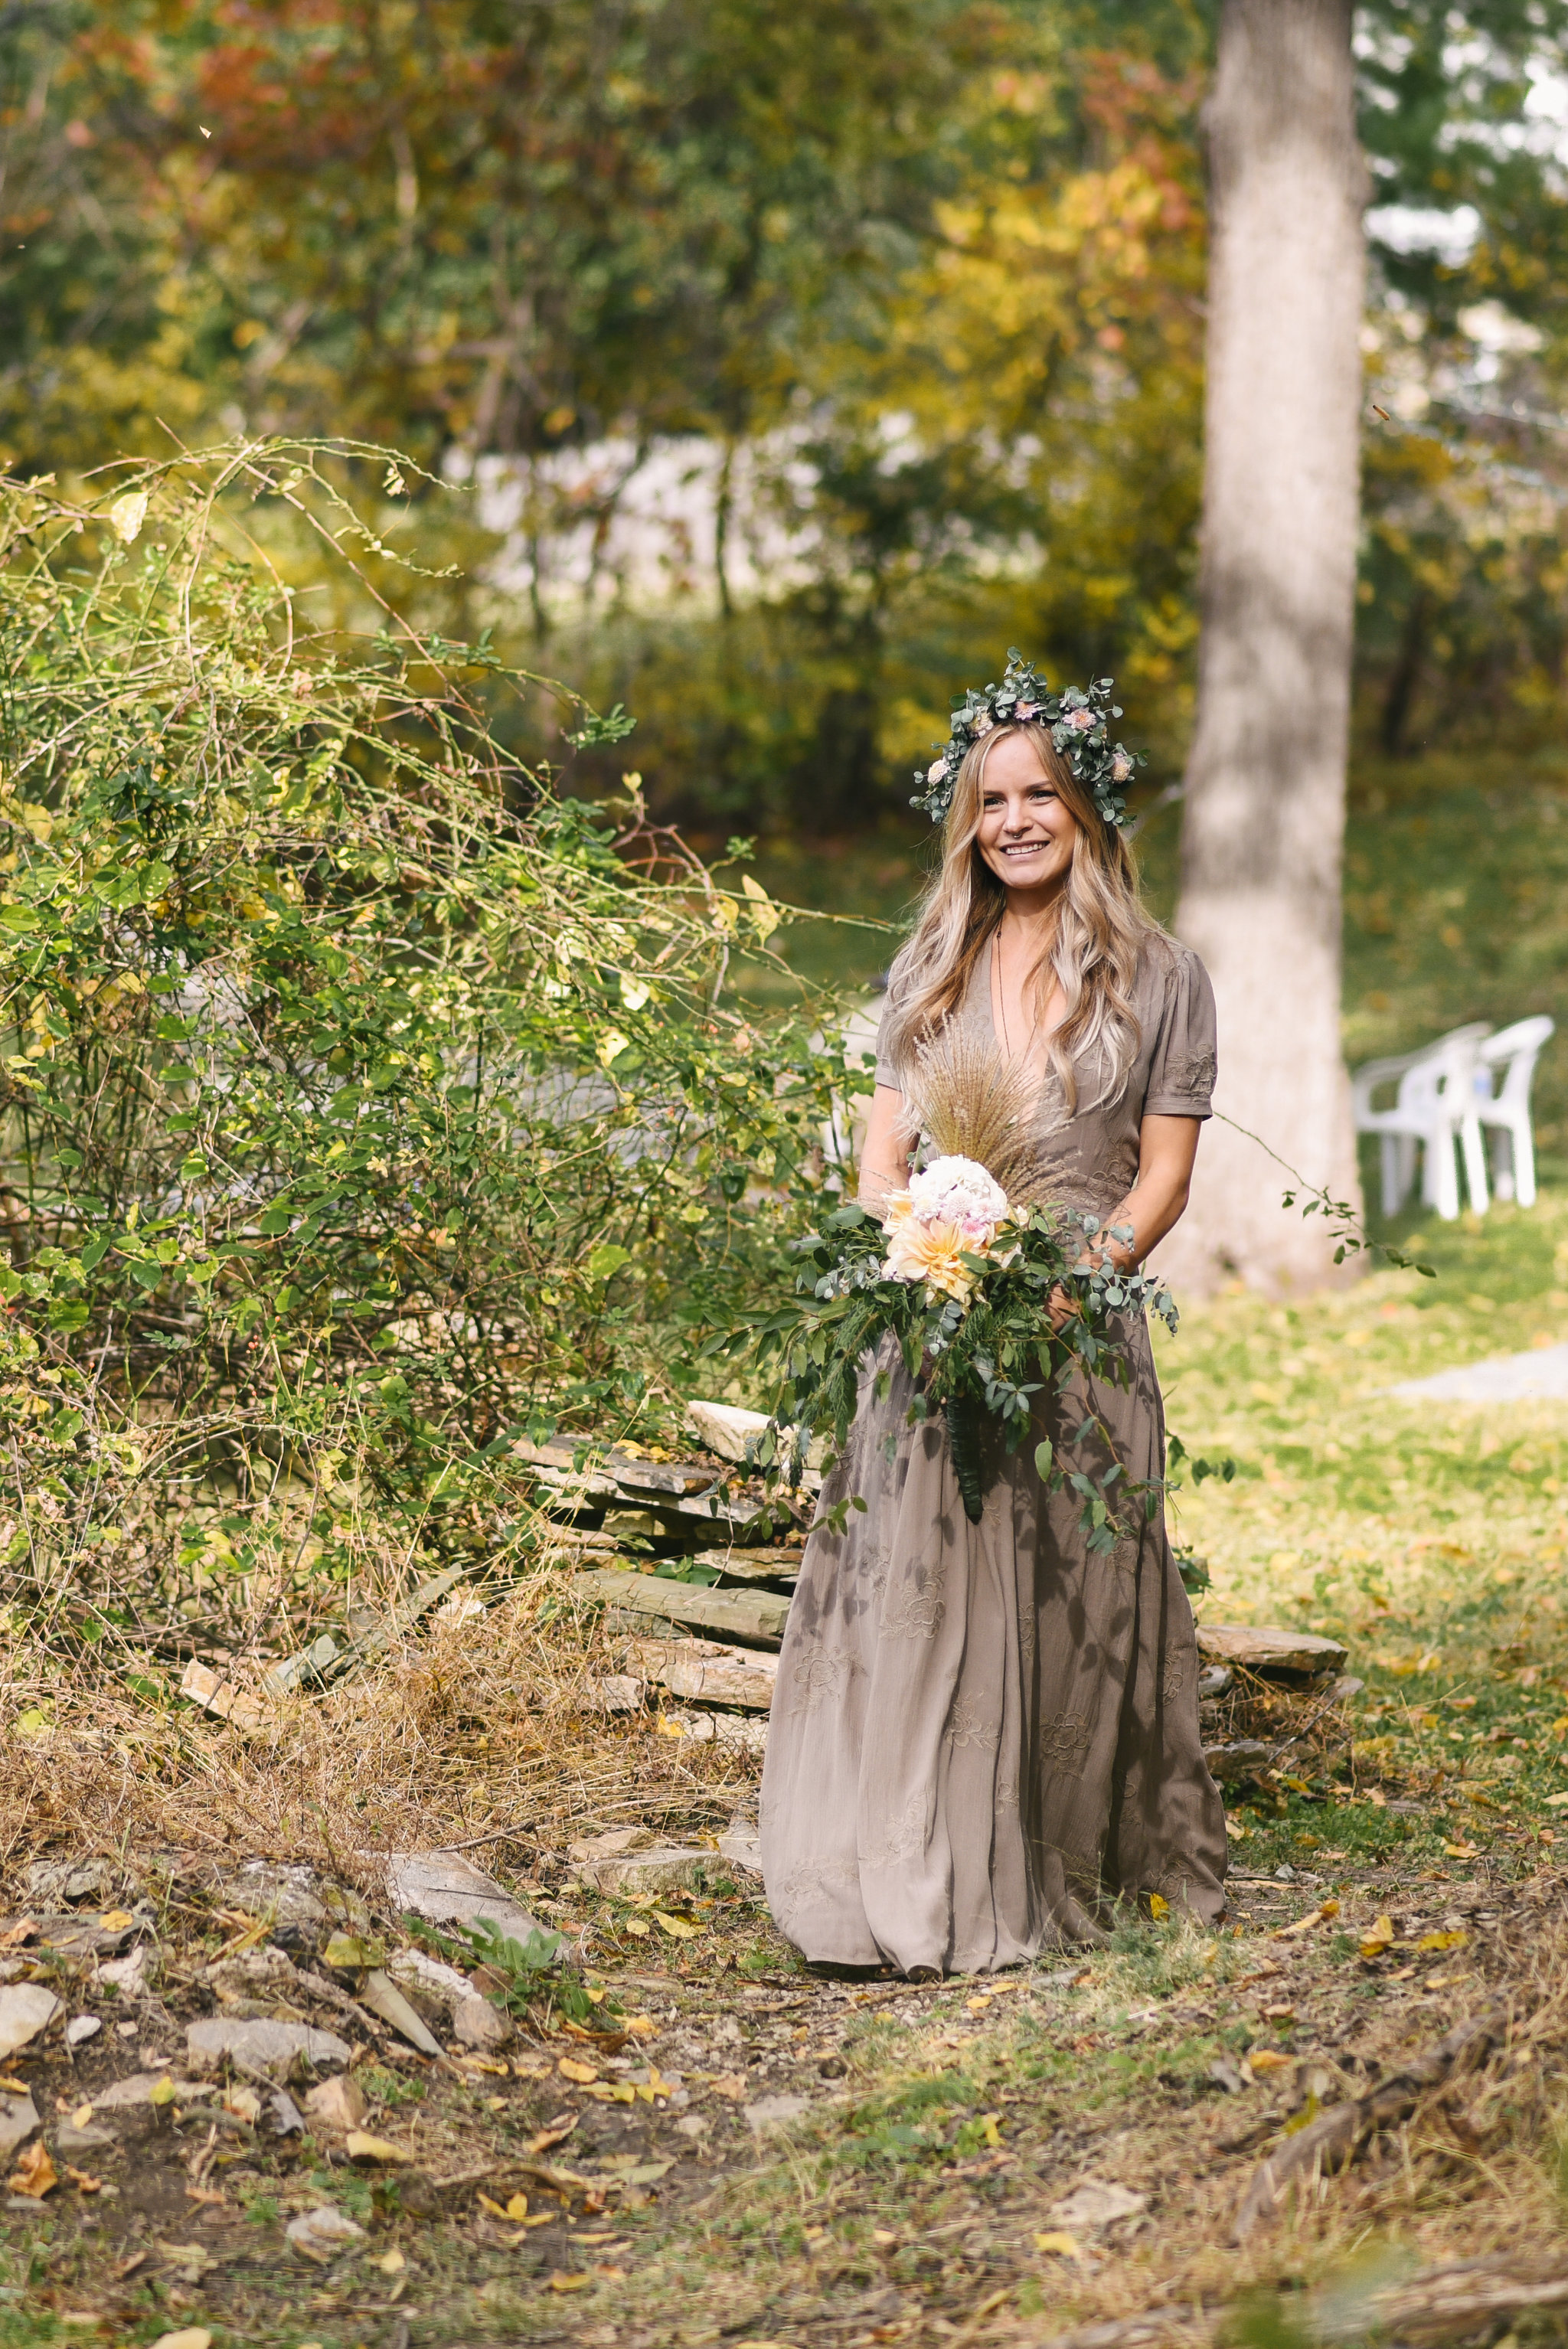 Baltimore, Maryland Wedding Photographer, Backyard Wedding, DIY, Rustic, Casual, Fall Wedding, Woodland, Butterbee Bridal Bouquet, Brightside Boutique Dress, Bride Walking Down Aisle